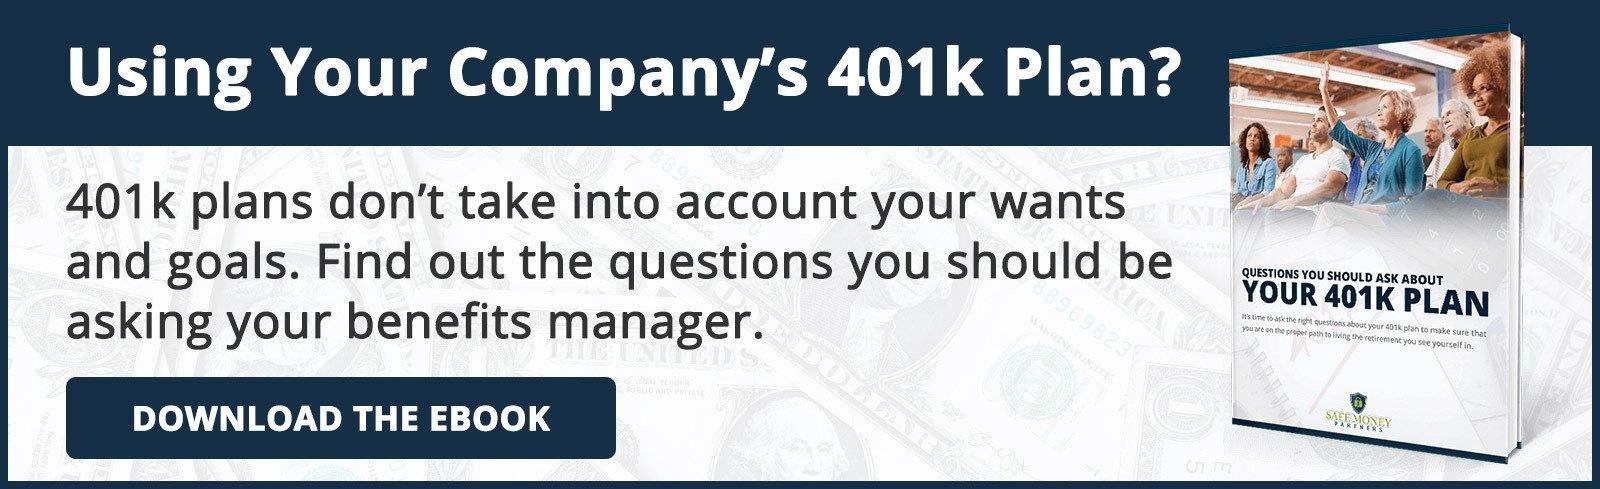 company-401k-plan